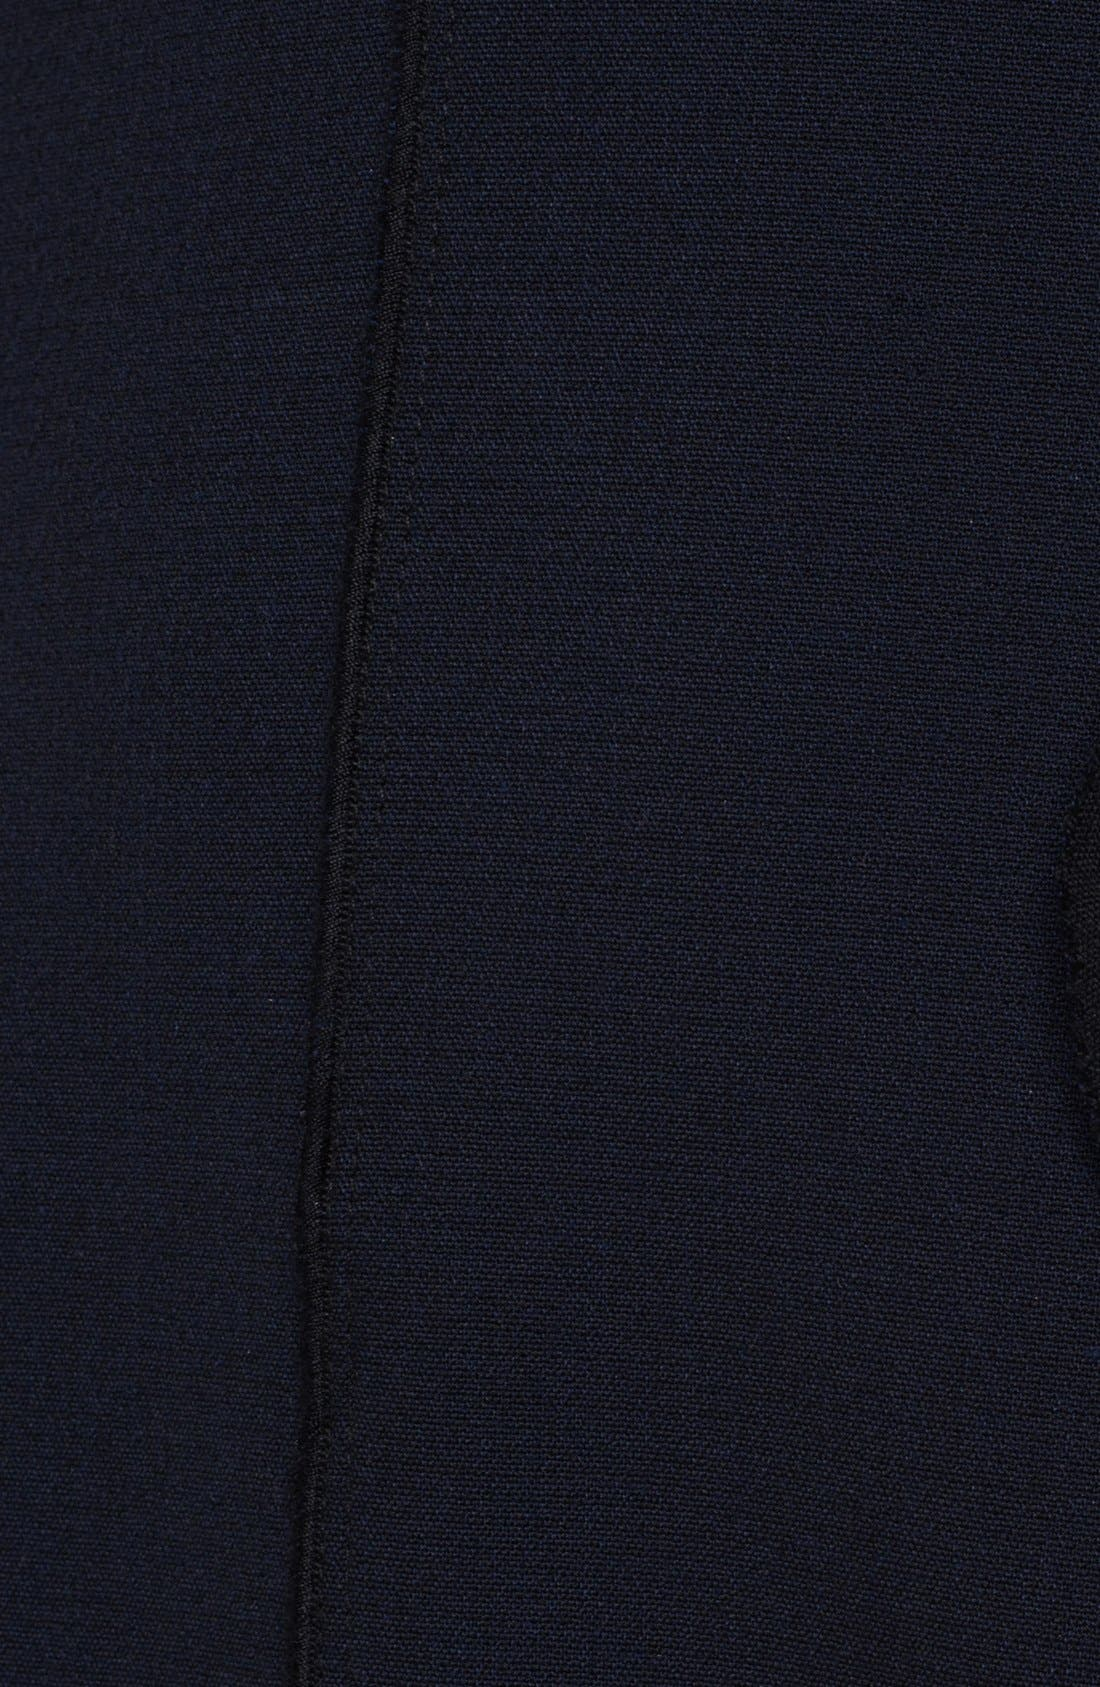 Alternate Image 3  - Tracy Reese Rose Detail Sheath Dress